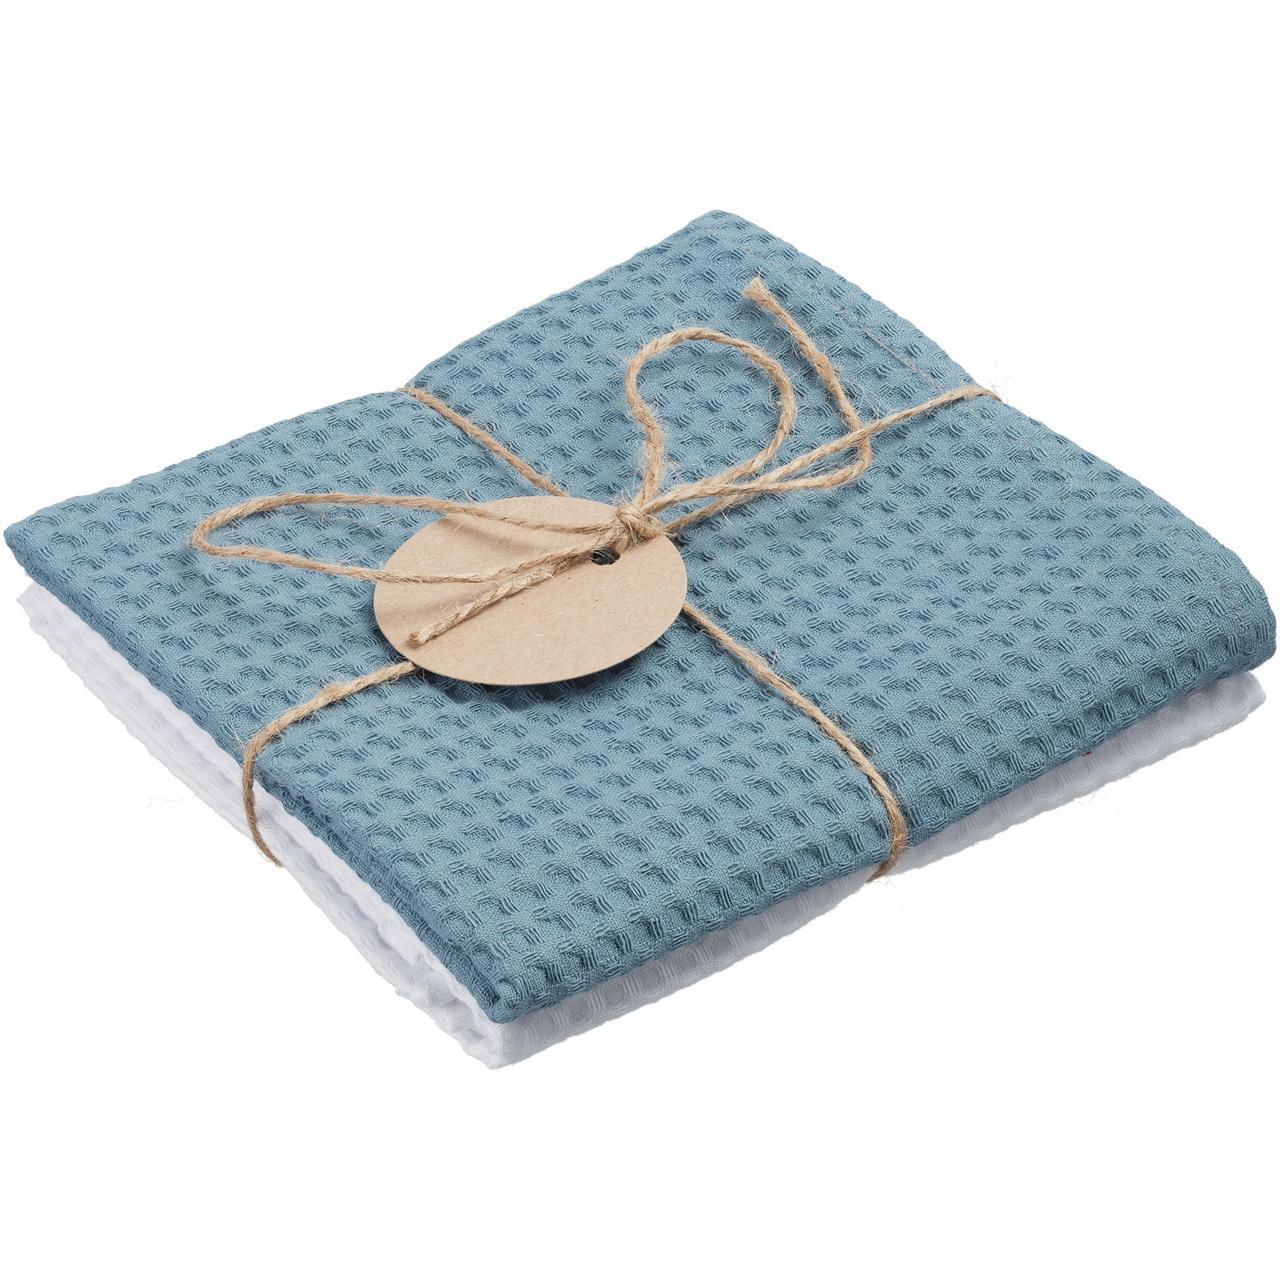 Набор кухонных полотенец Good Wipe, белый с серо-голубым (артикул 11176.61)